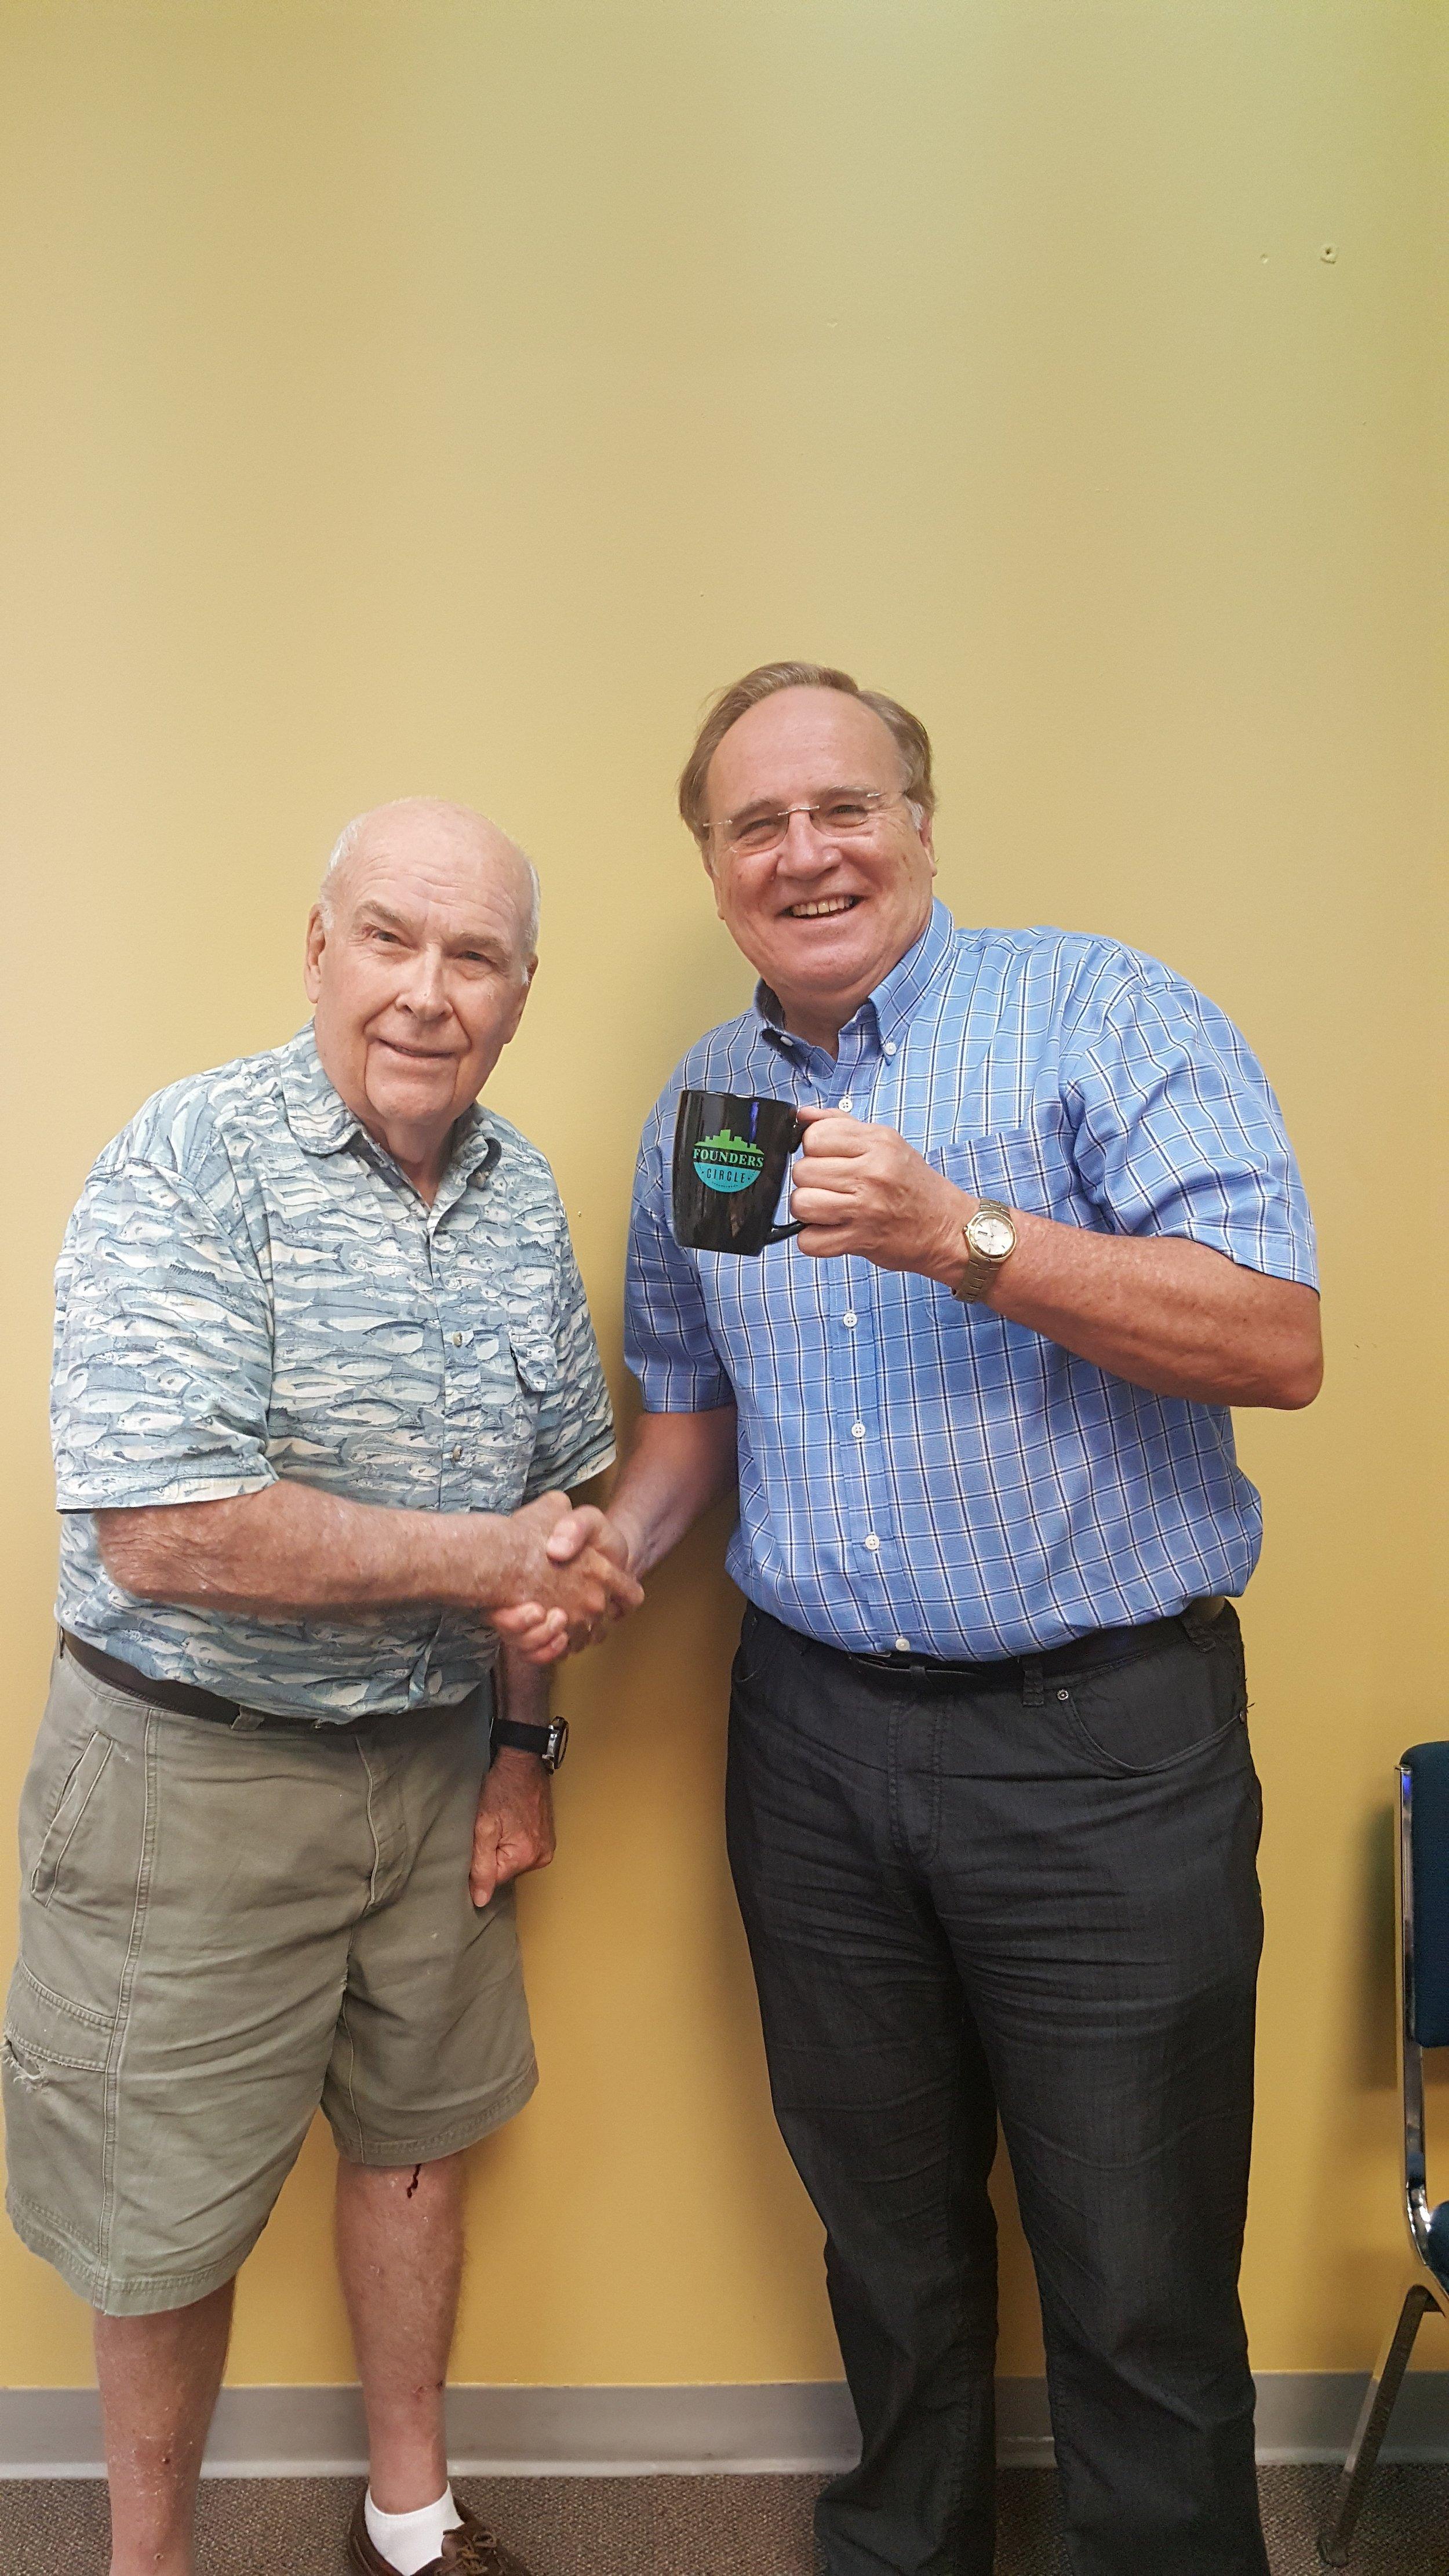 Stuart Morley presenting the Founders Circle mug to John Cooper